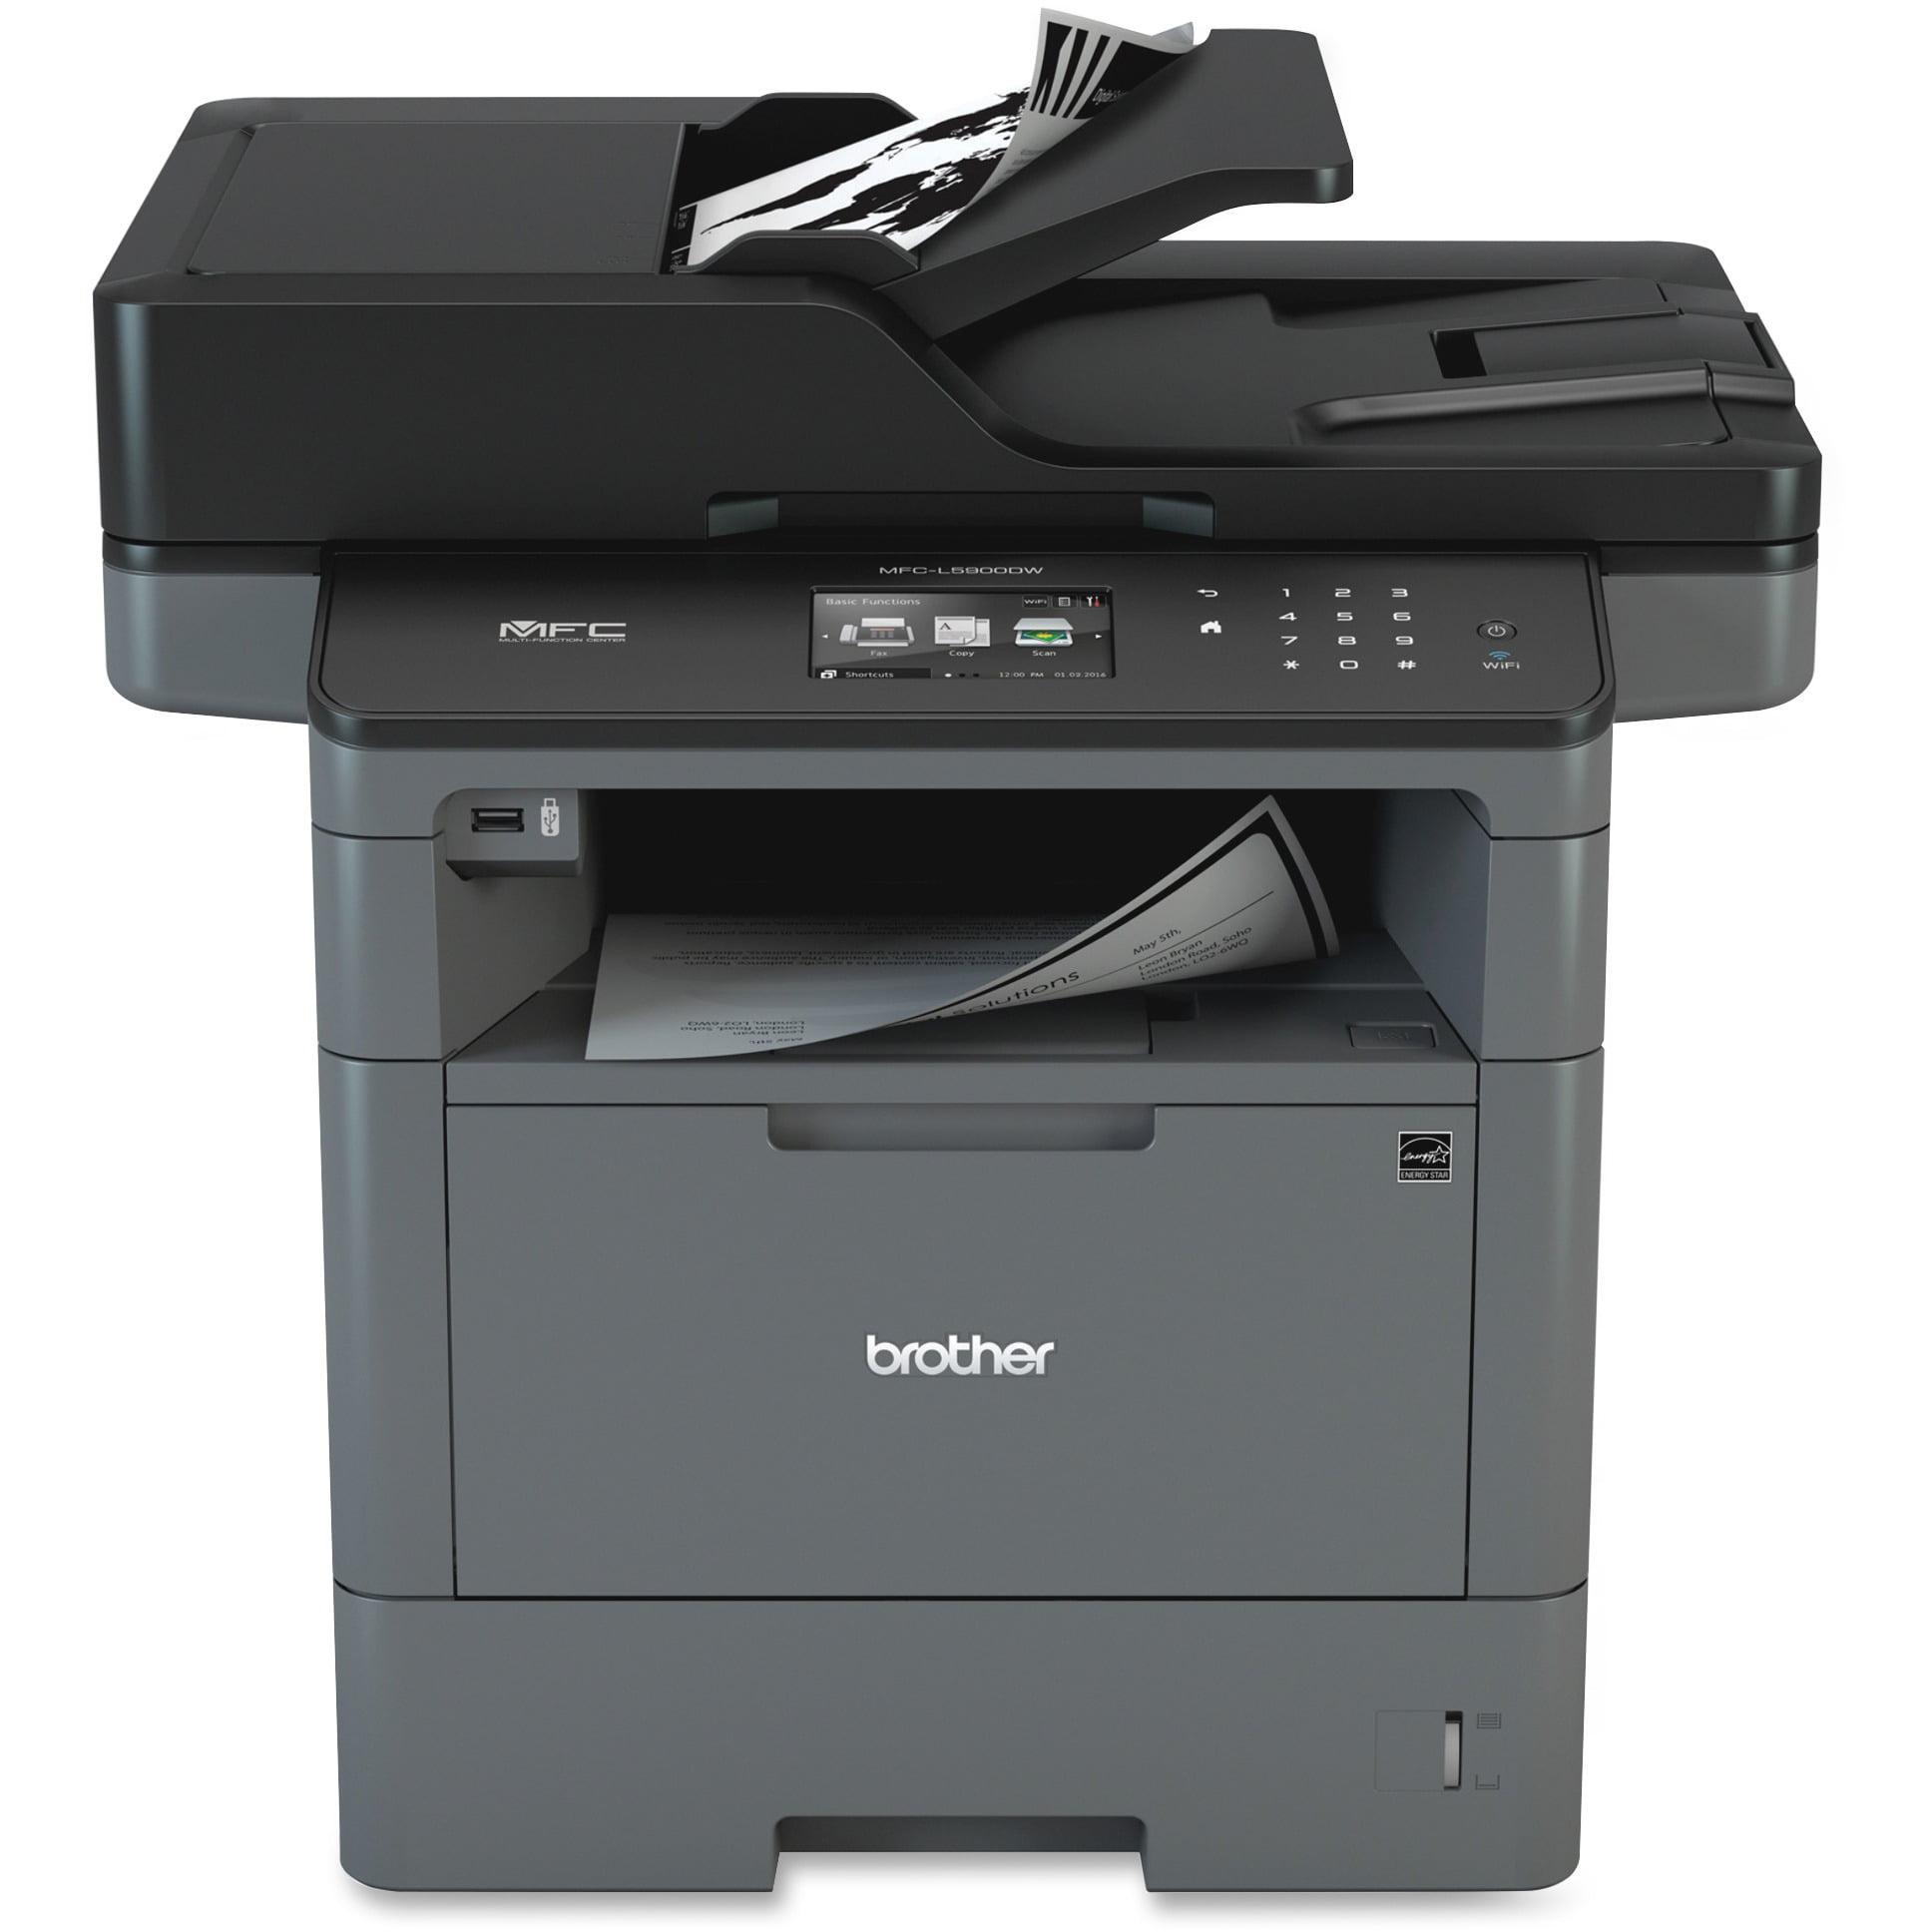 Brother MFC-L5900DW Laser Multifunction Printer - Monochr...